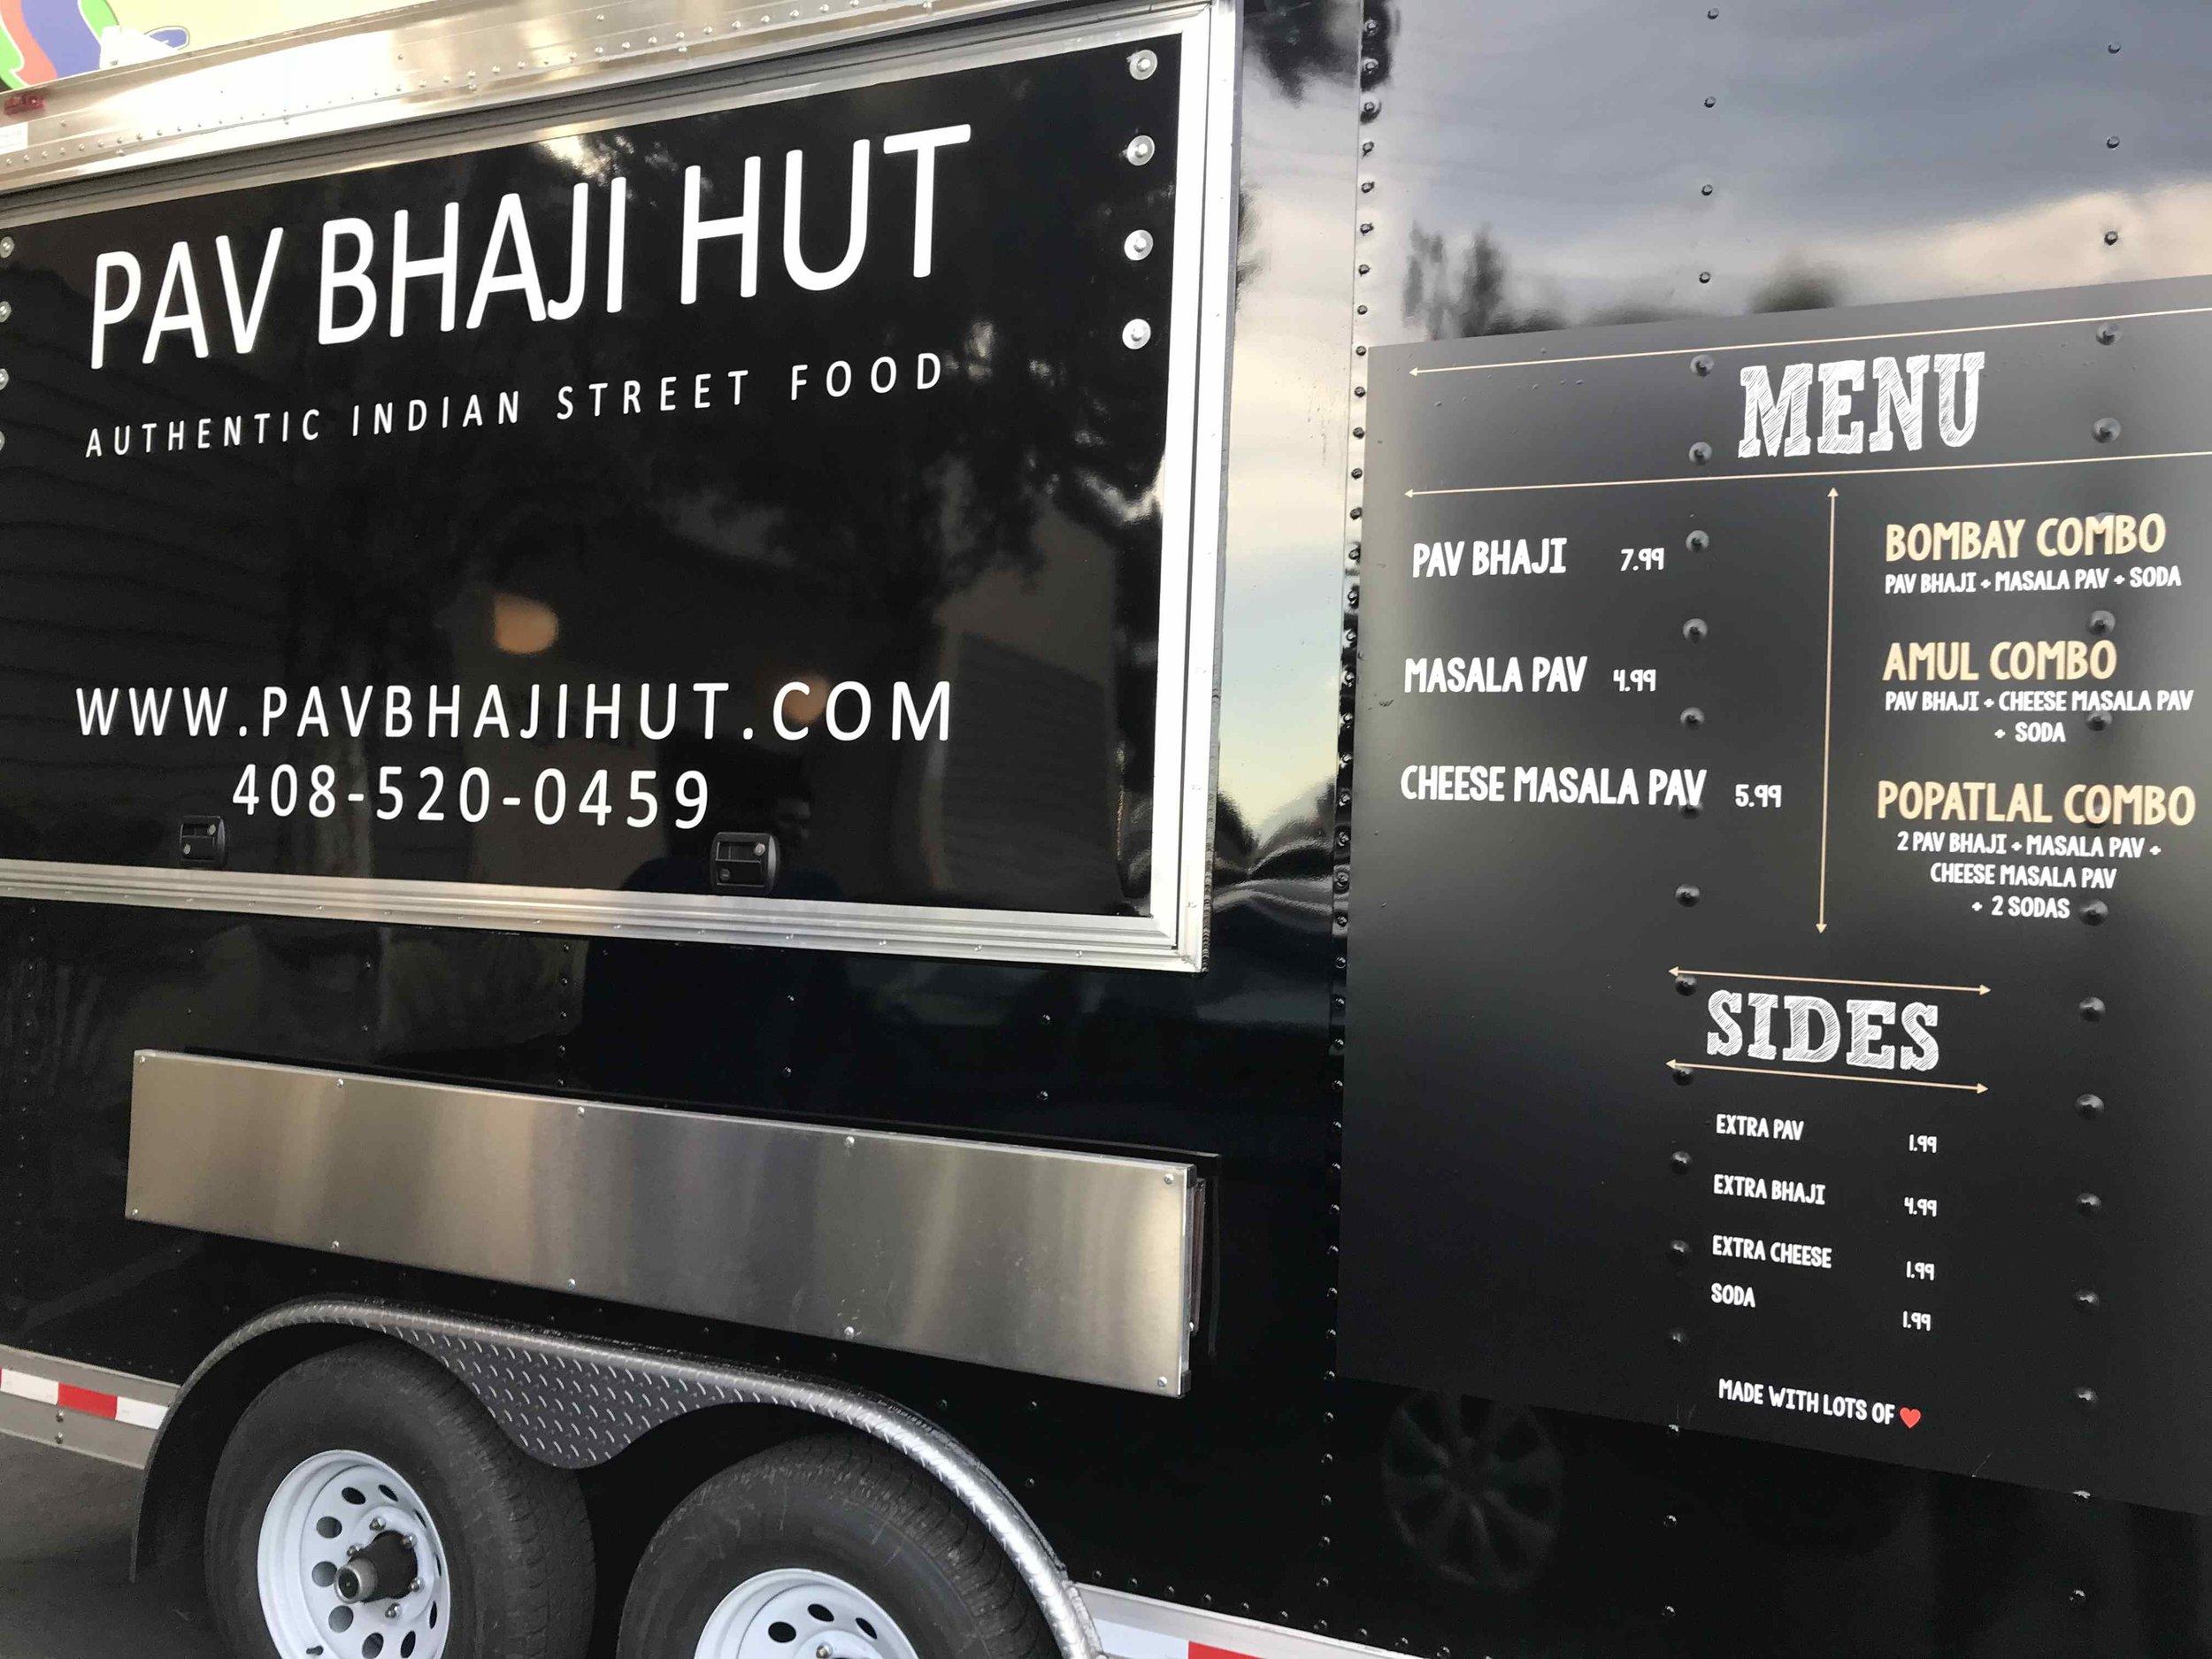 Food-Truck-Viny-Decal.jpg